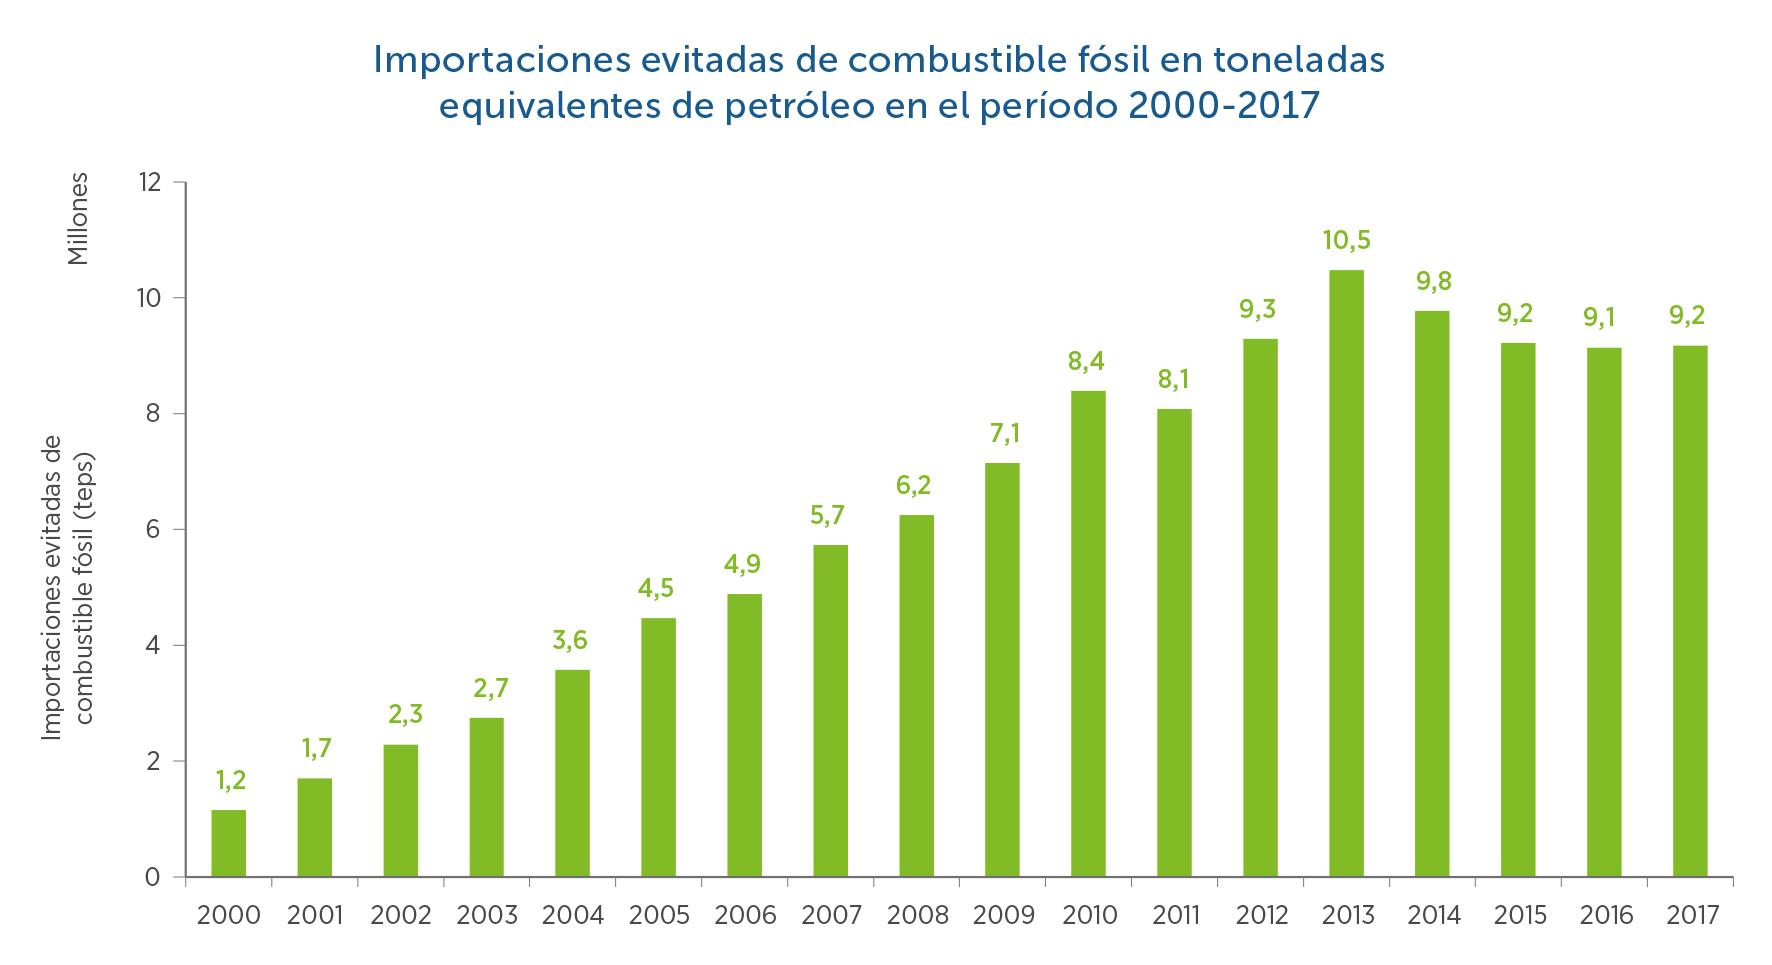 17-Importaciones-evitadas-combustible-fosil